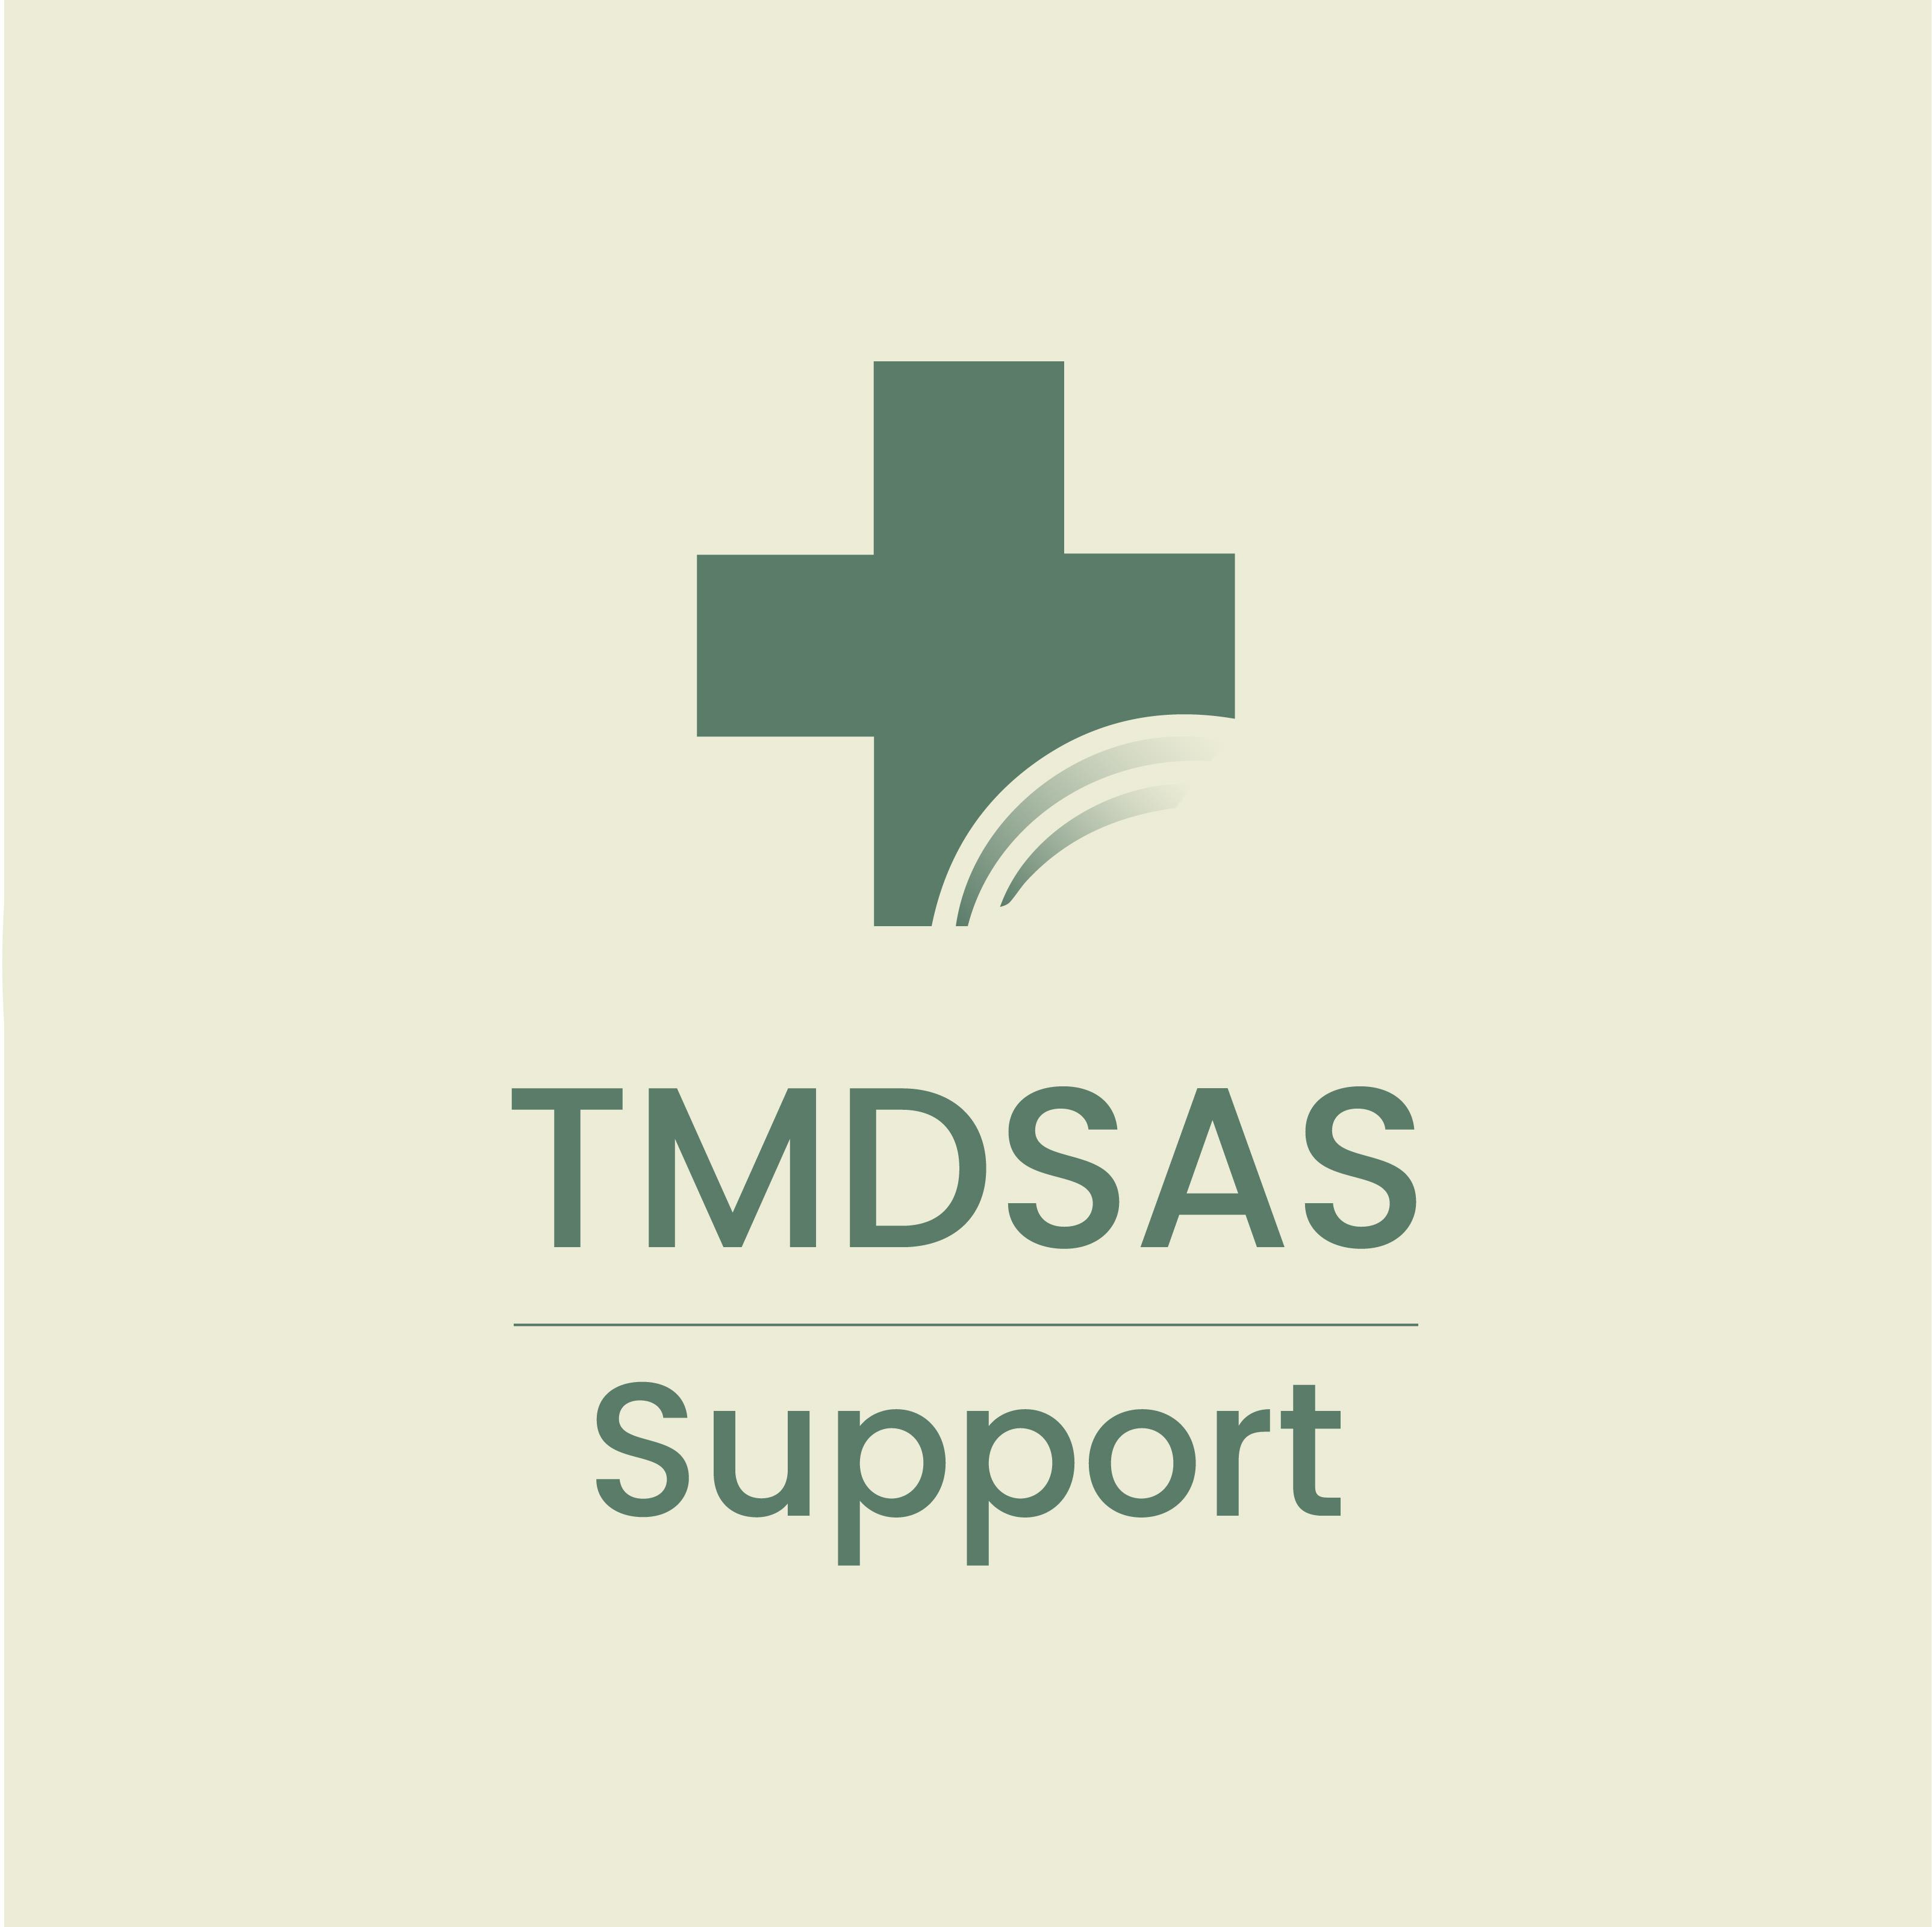 TMDSAS Support